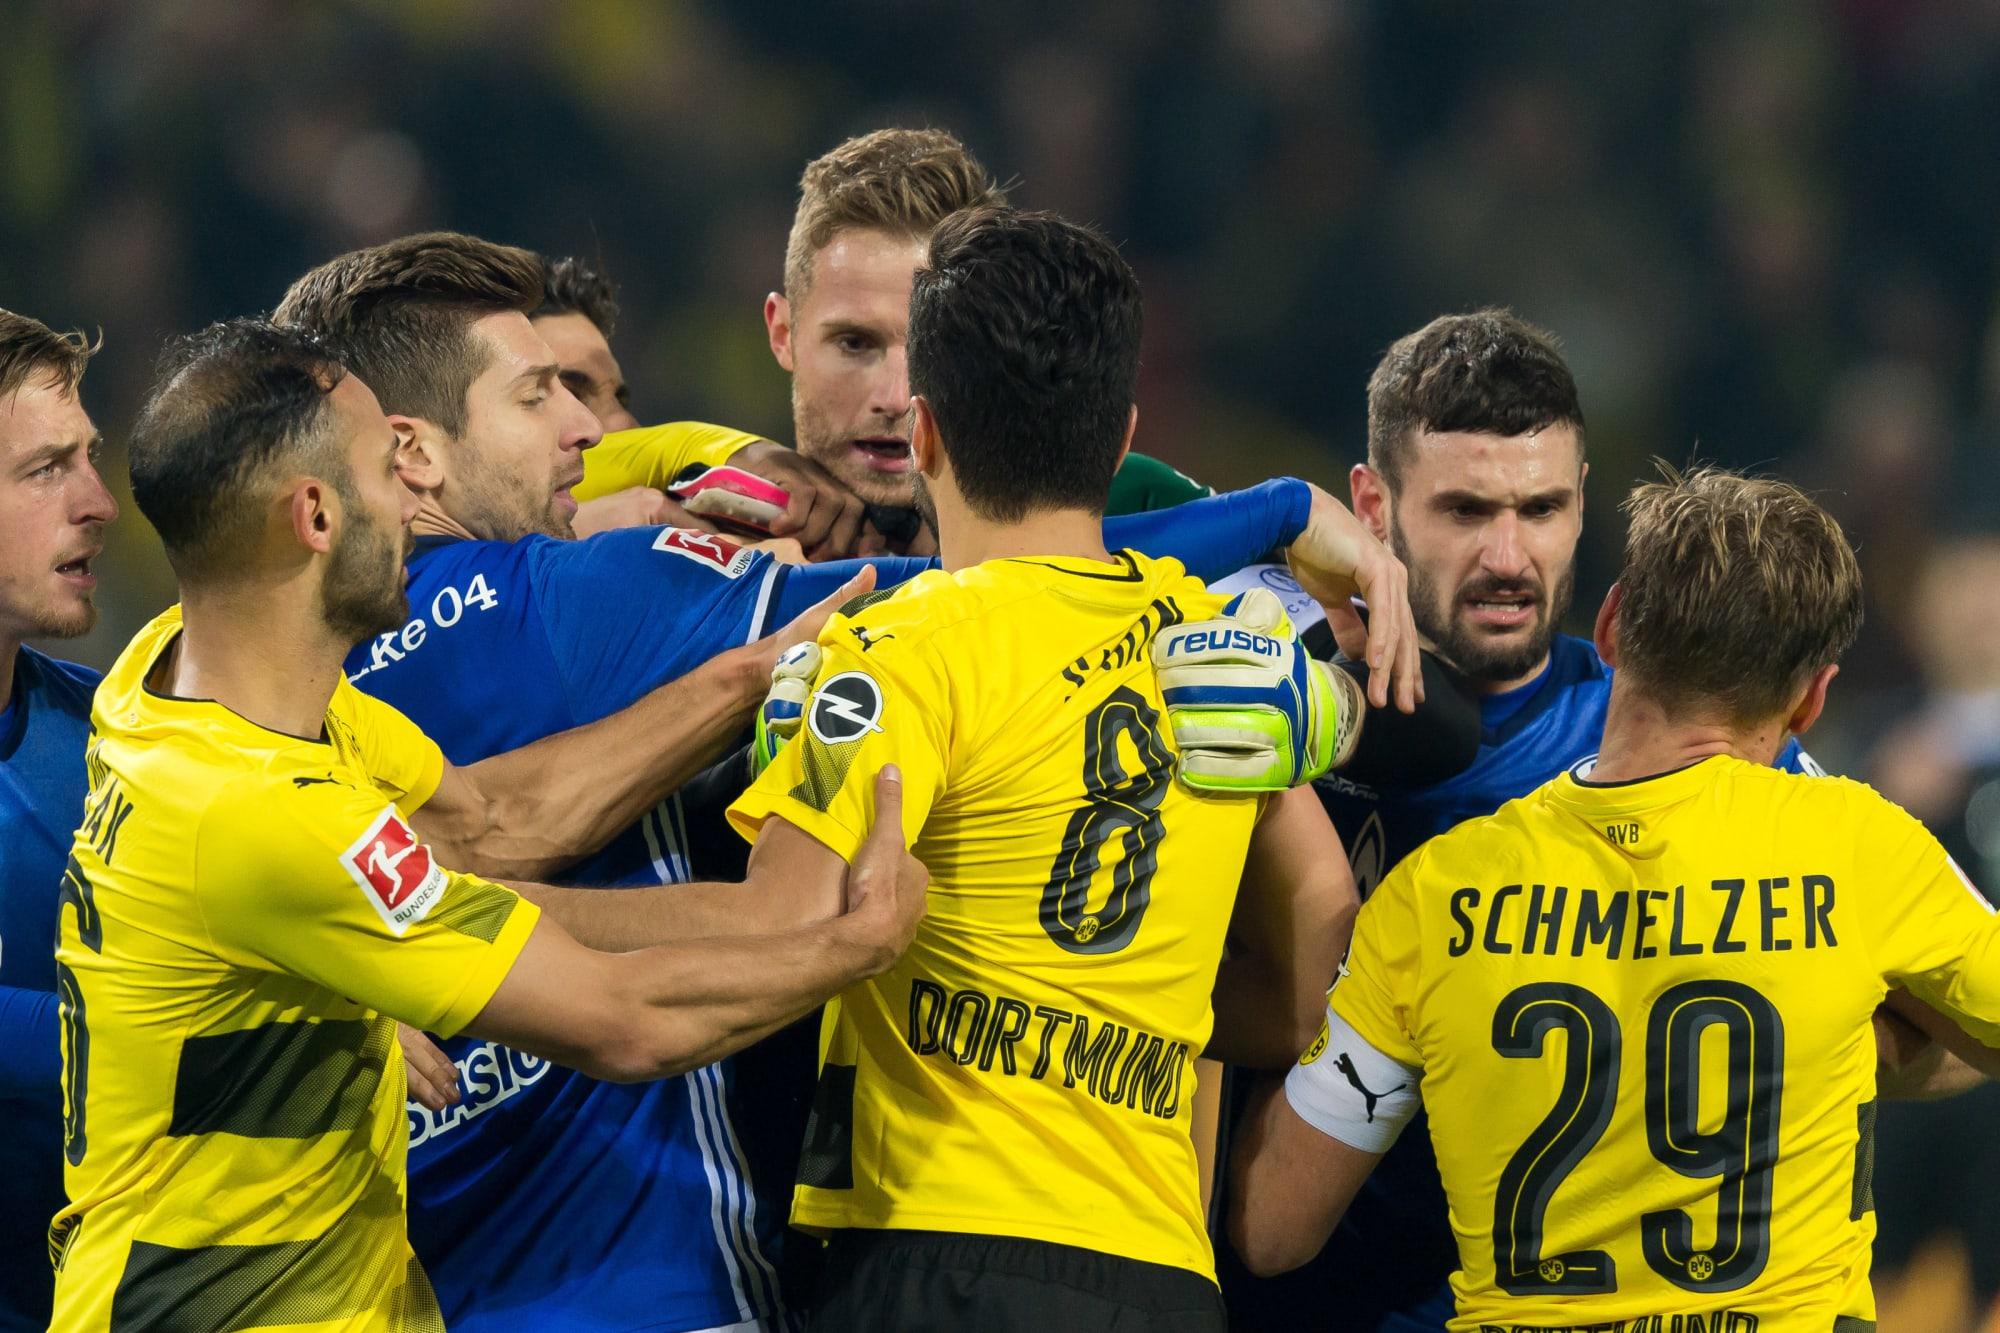 Match Preview: Borussia Dortmund face Schalke 04 in crucial Revierderby